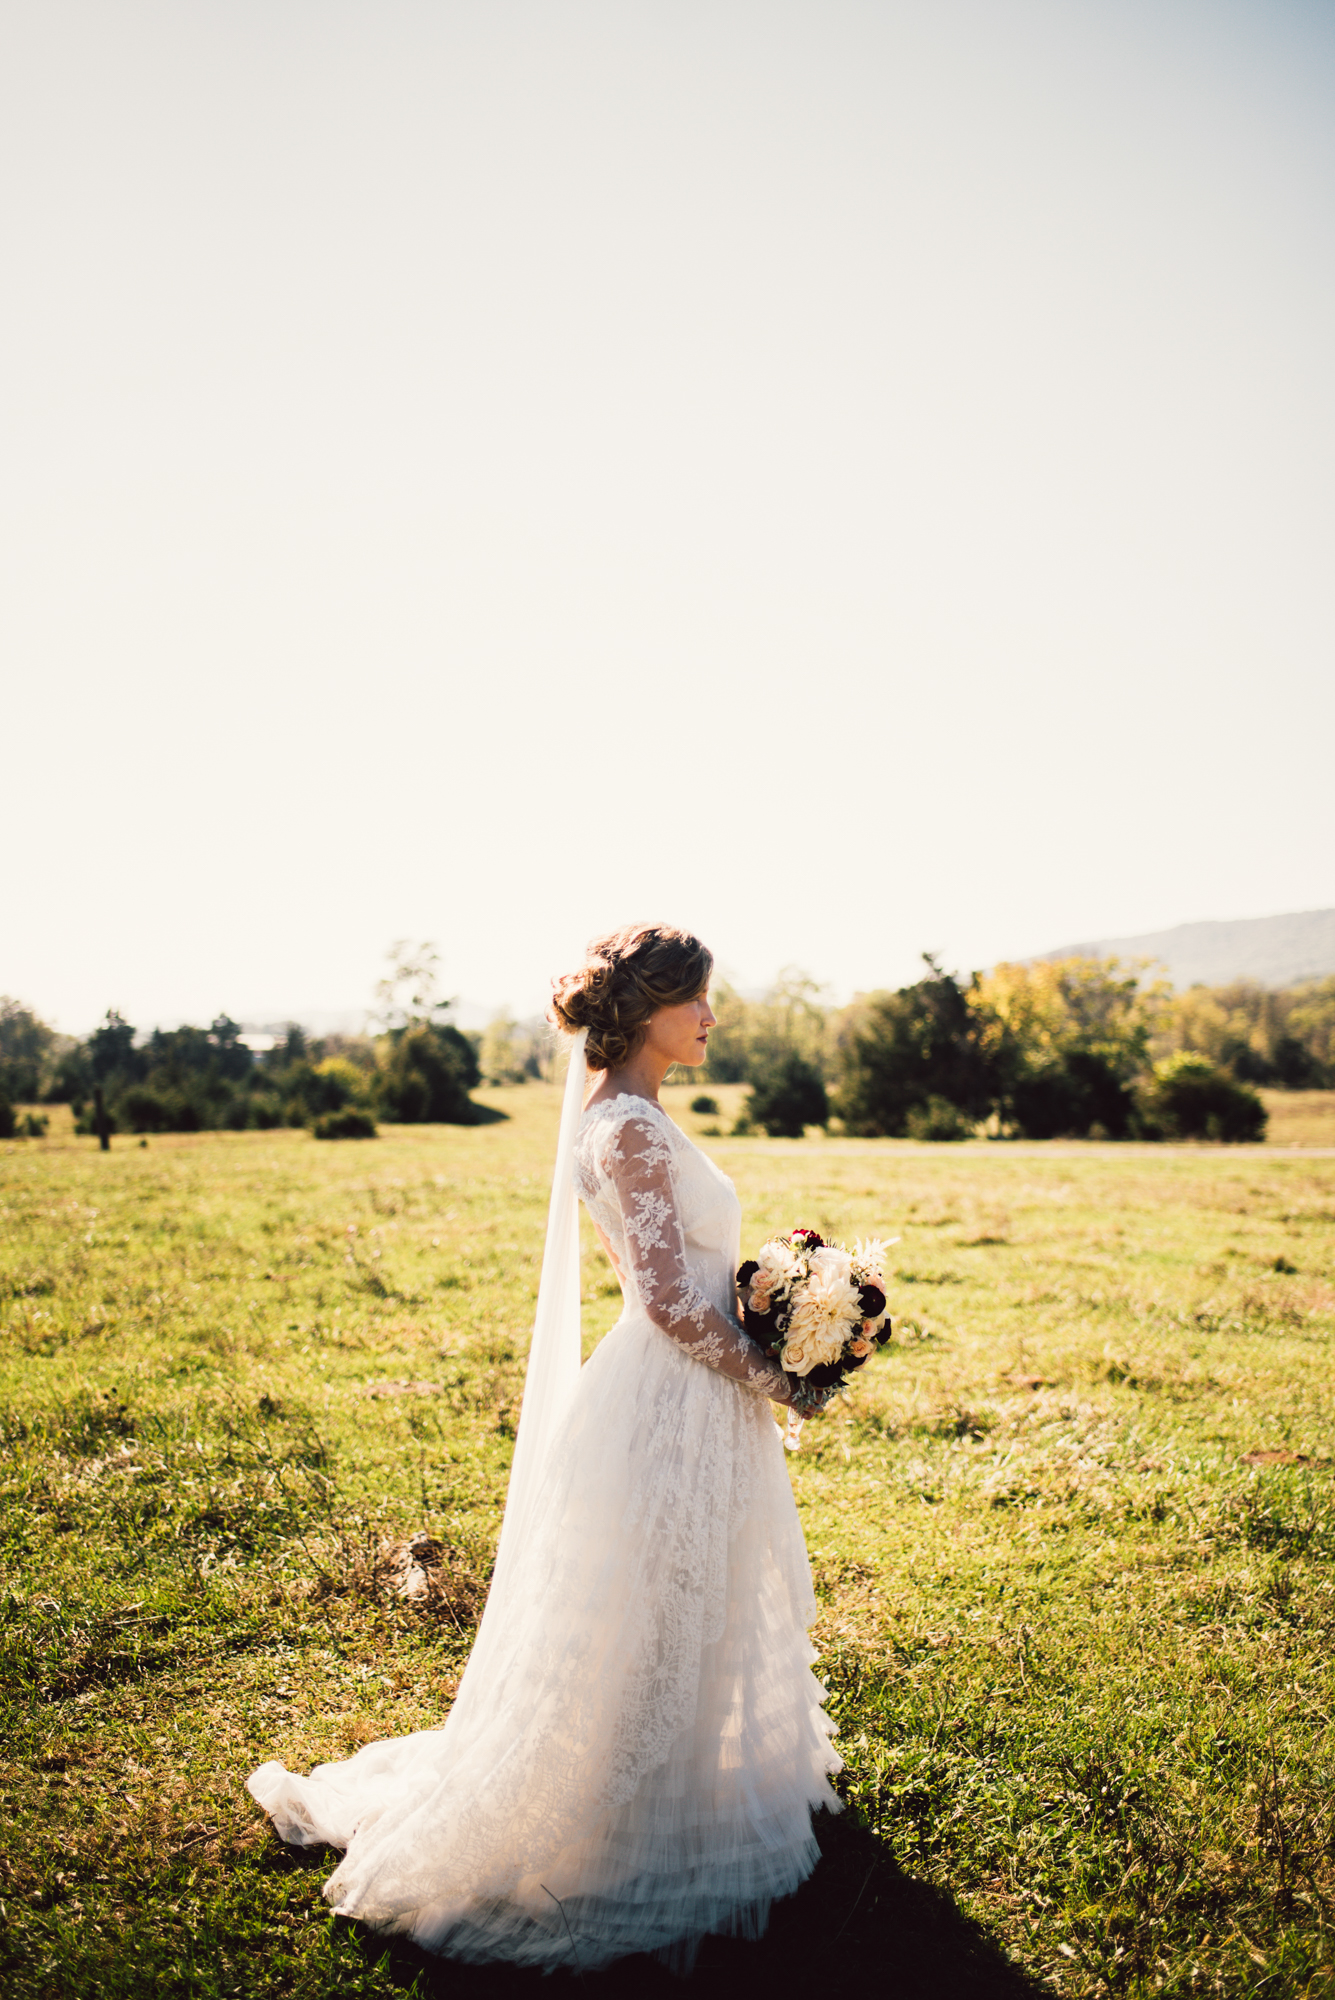 Ashley-and-Michael-Beaune-Woodstock-Virginia-Wedding-Shenandoah-Valley_21.JPG